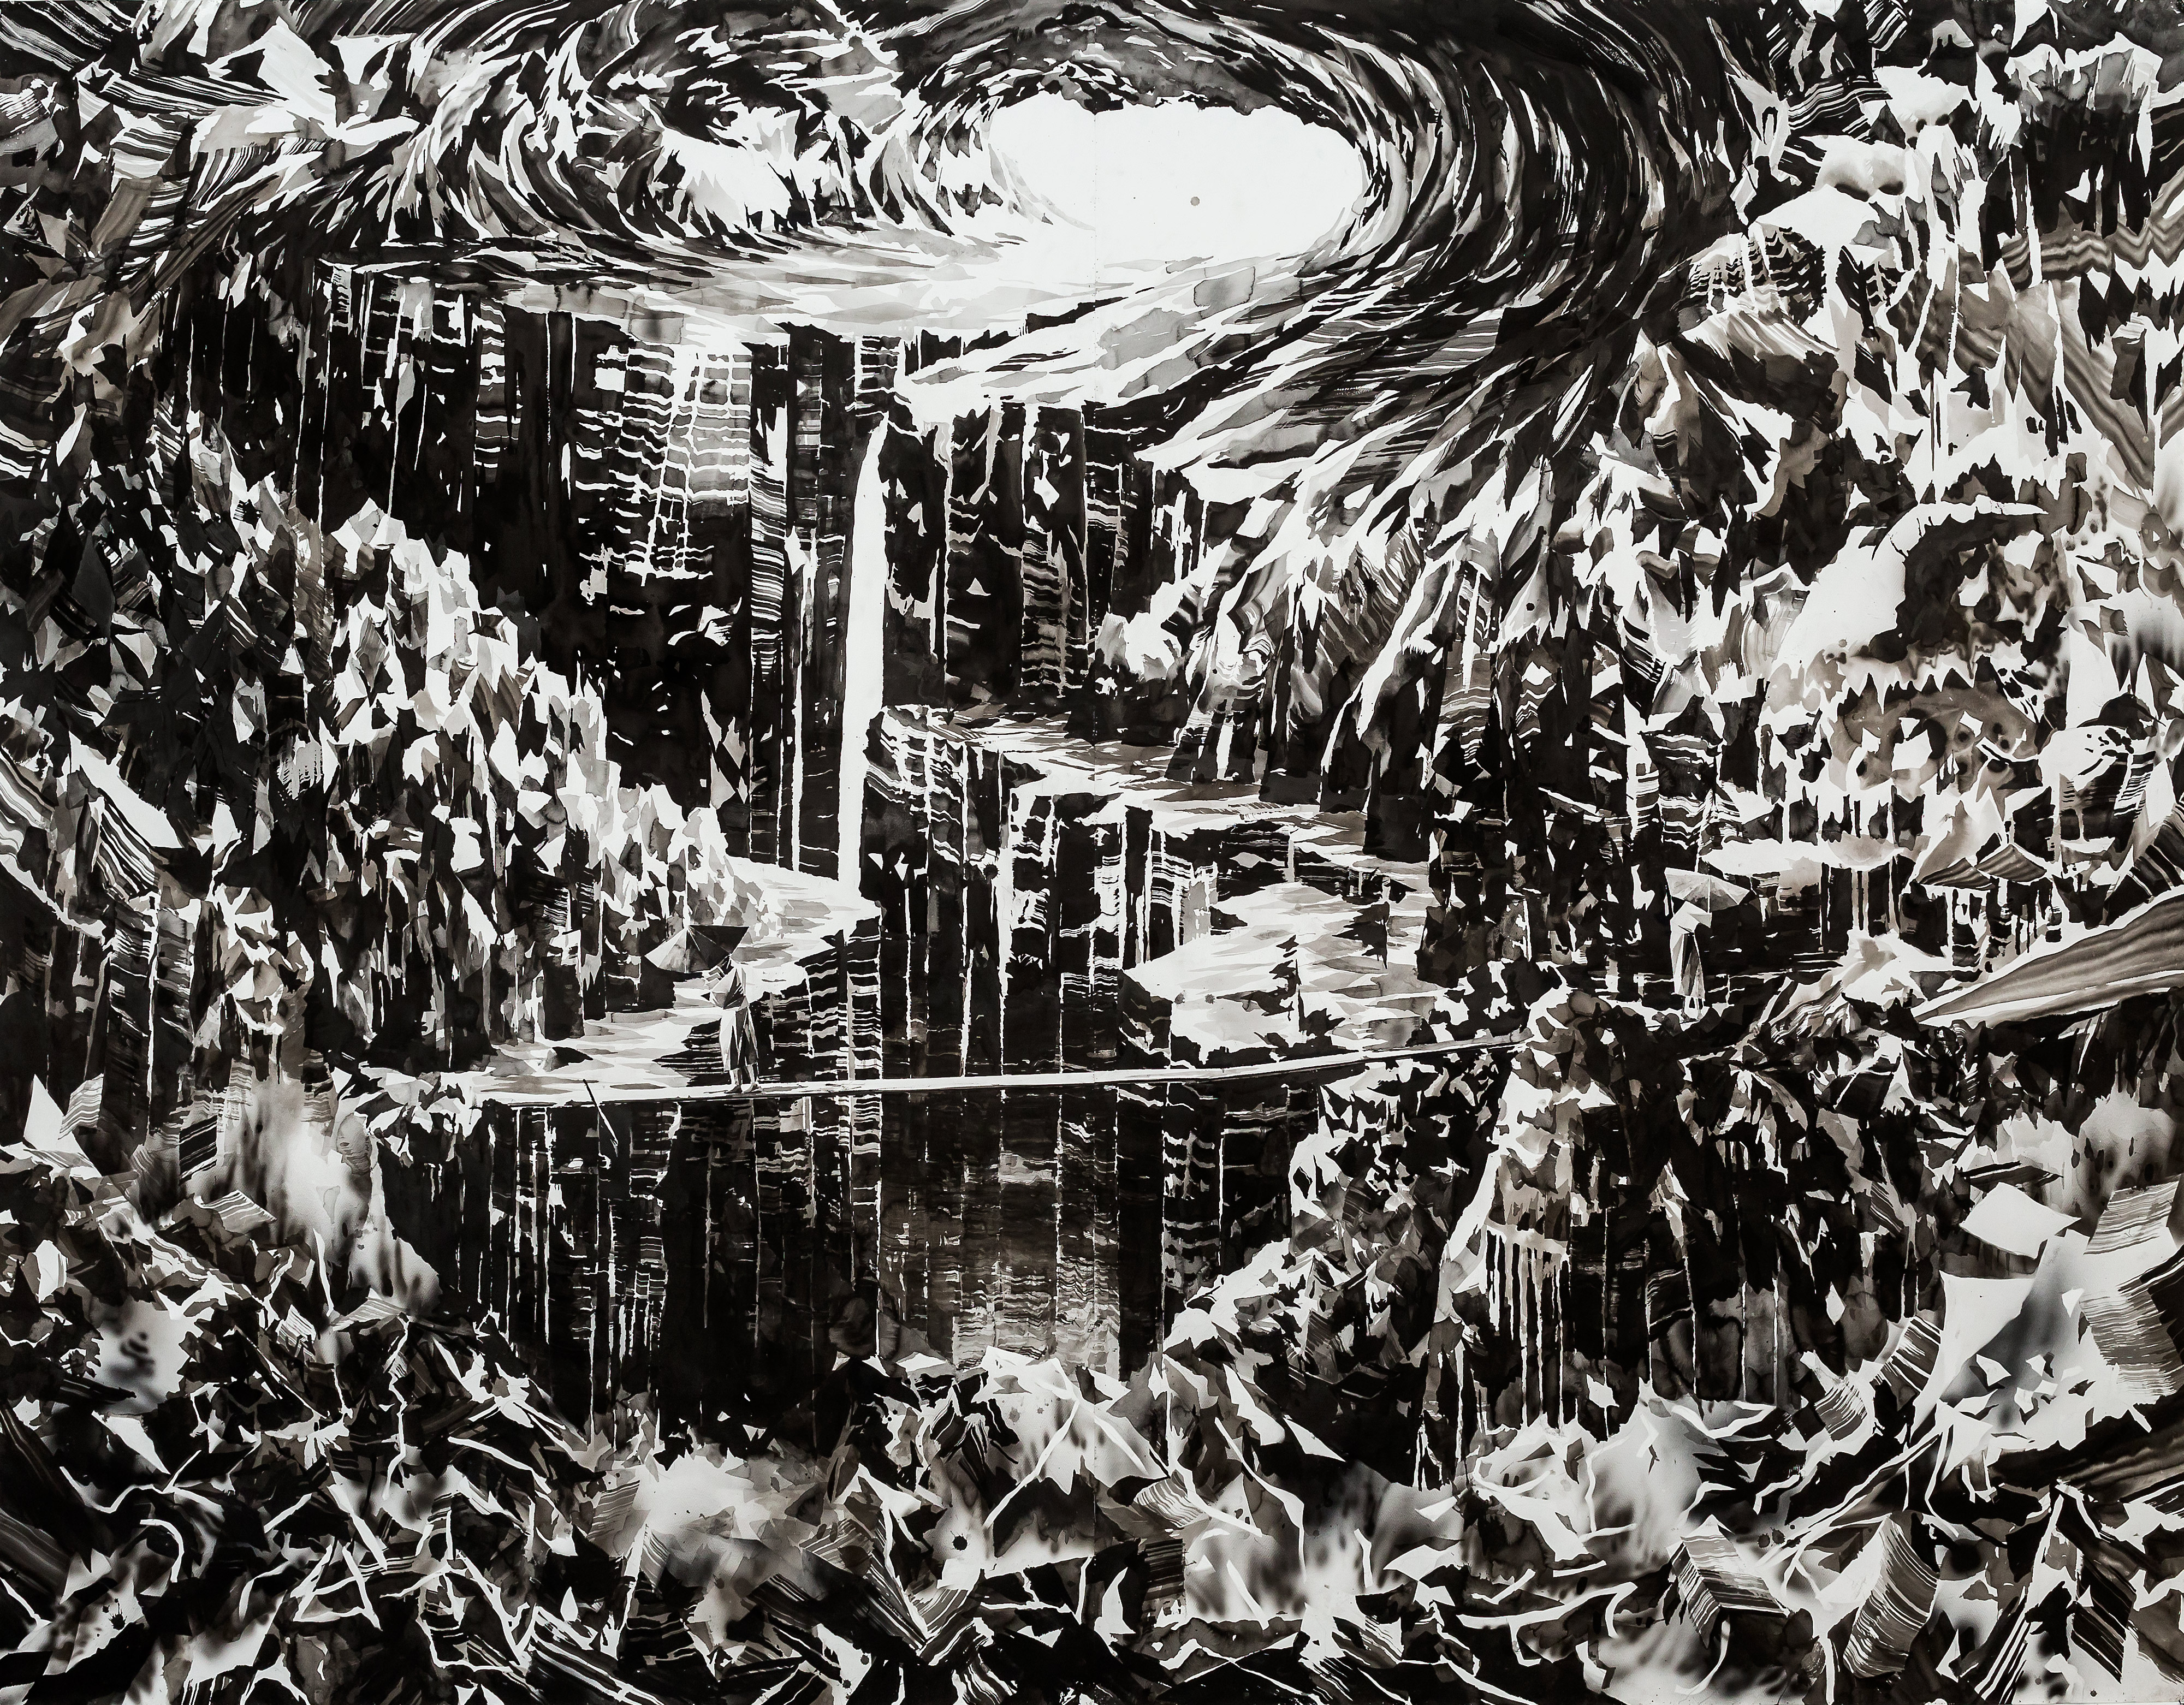 Galerie Barbara Thumm \ New Viewings #26 \ New Viewings #26